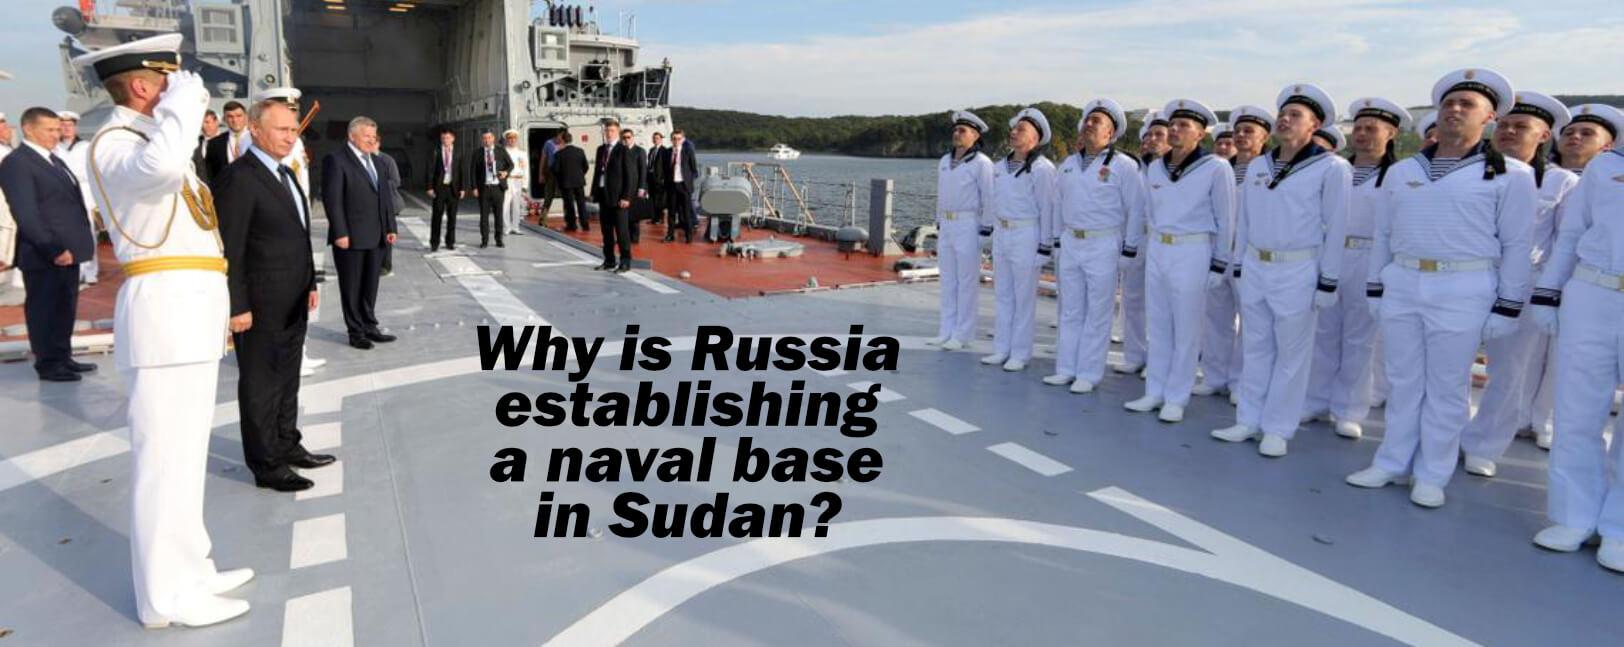 Russian Naval Base in Sudan